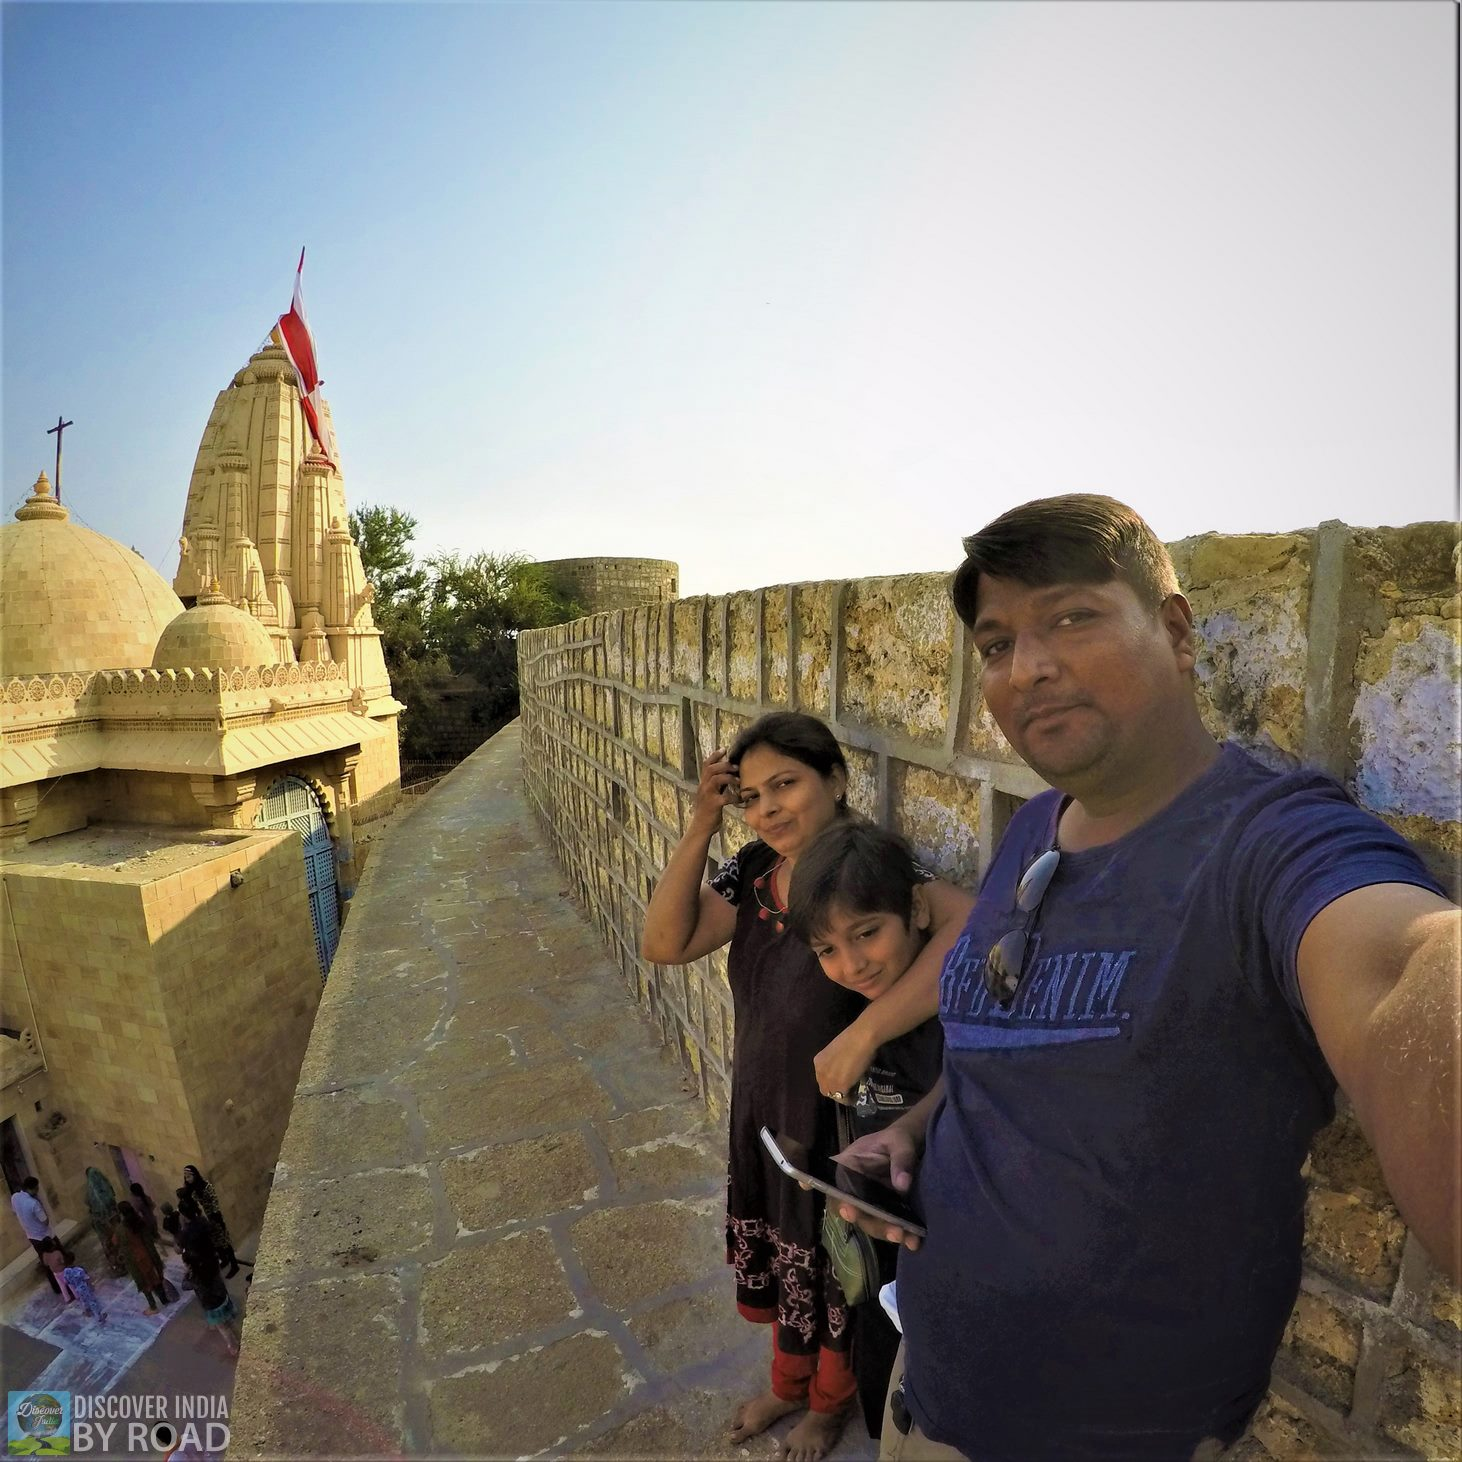 Family photo on wall of Narayan Sarovar